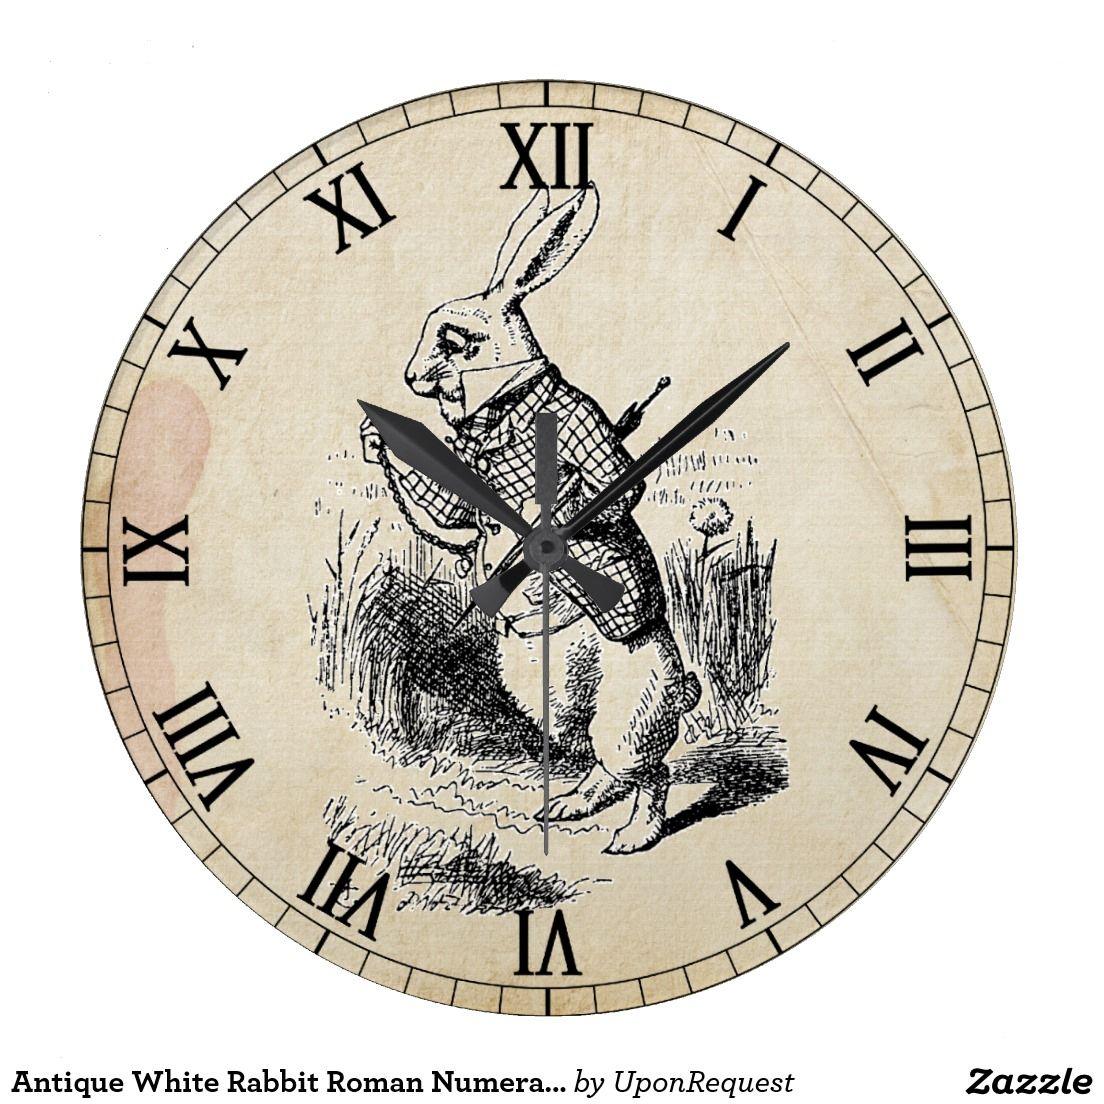 Antique white rabbit roman numeral wall clock via zazzle home antique white rabbit roman numeral wall clock via zazzle amipublicfo Image collections